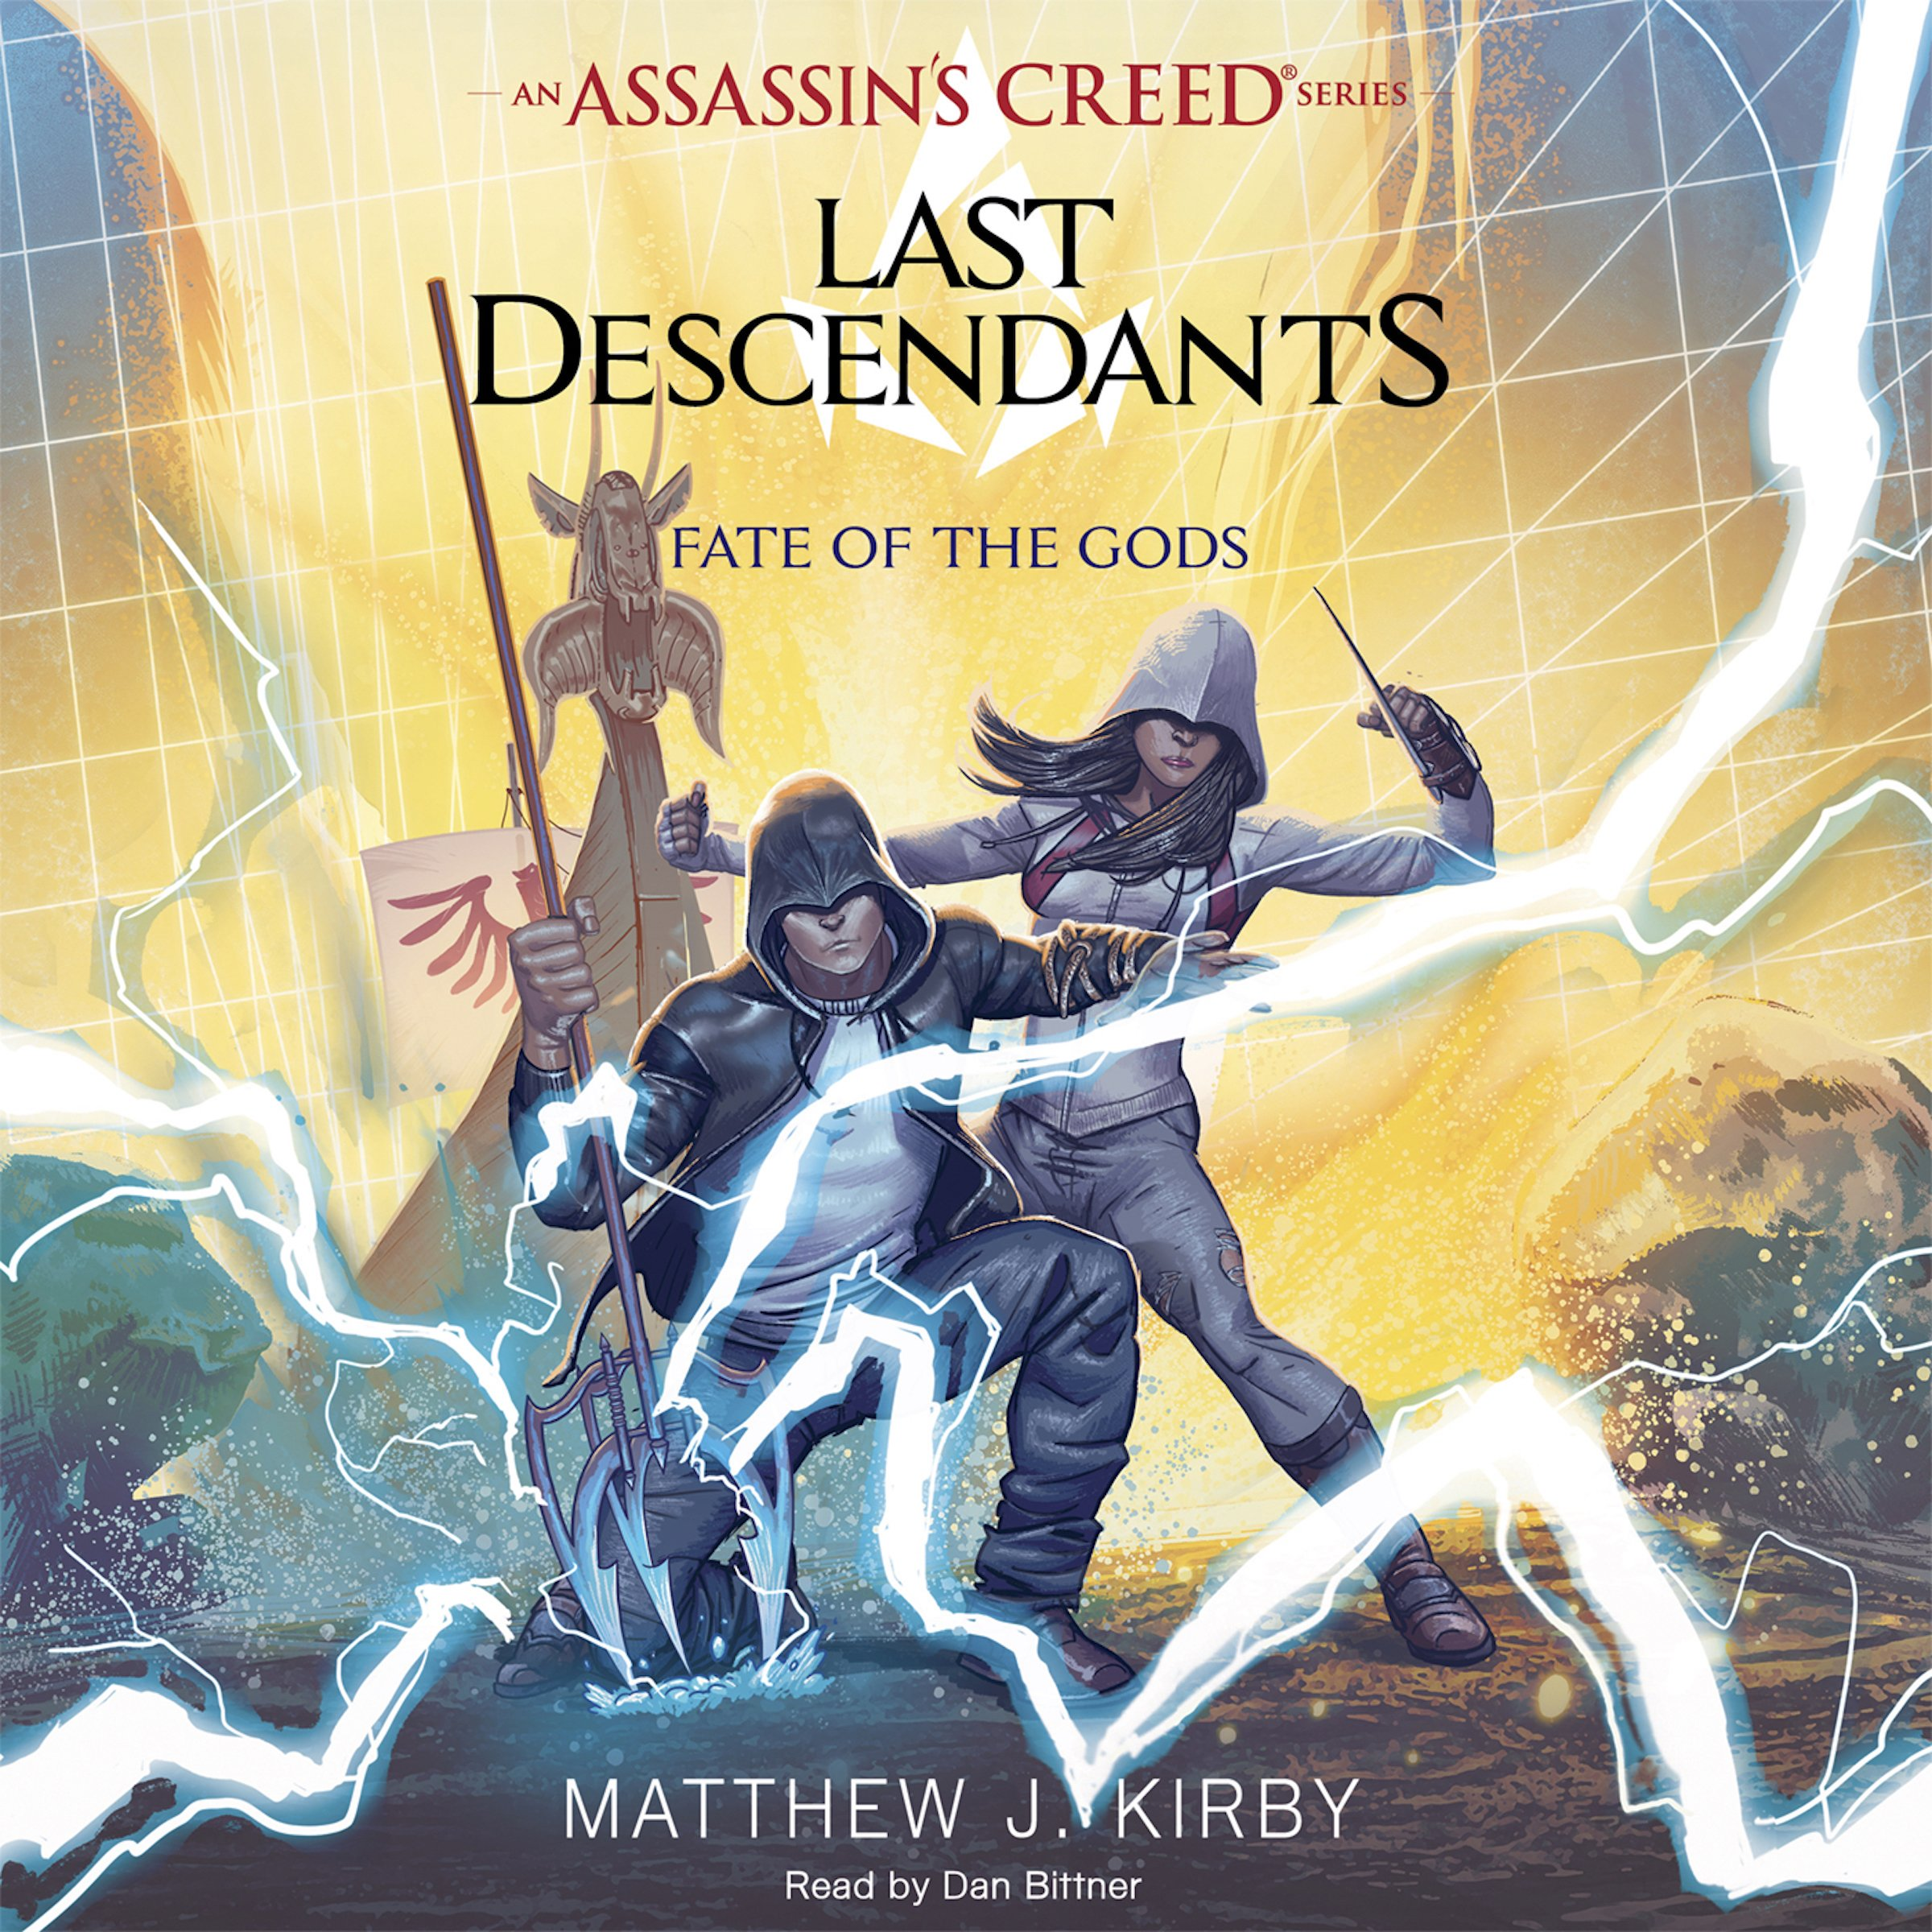 Fate of the Gods: Last Descendants: An Assassin's Creed Novel Series, Book 3